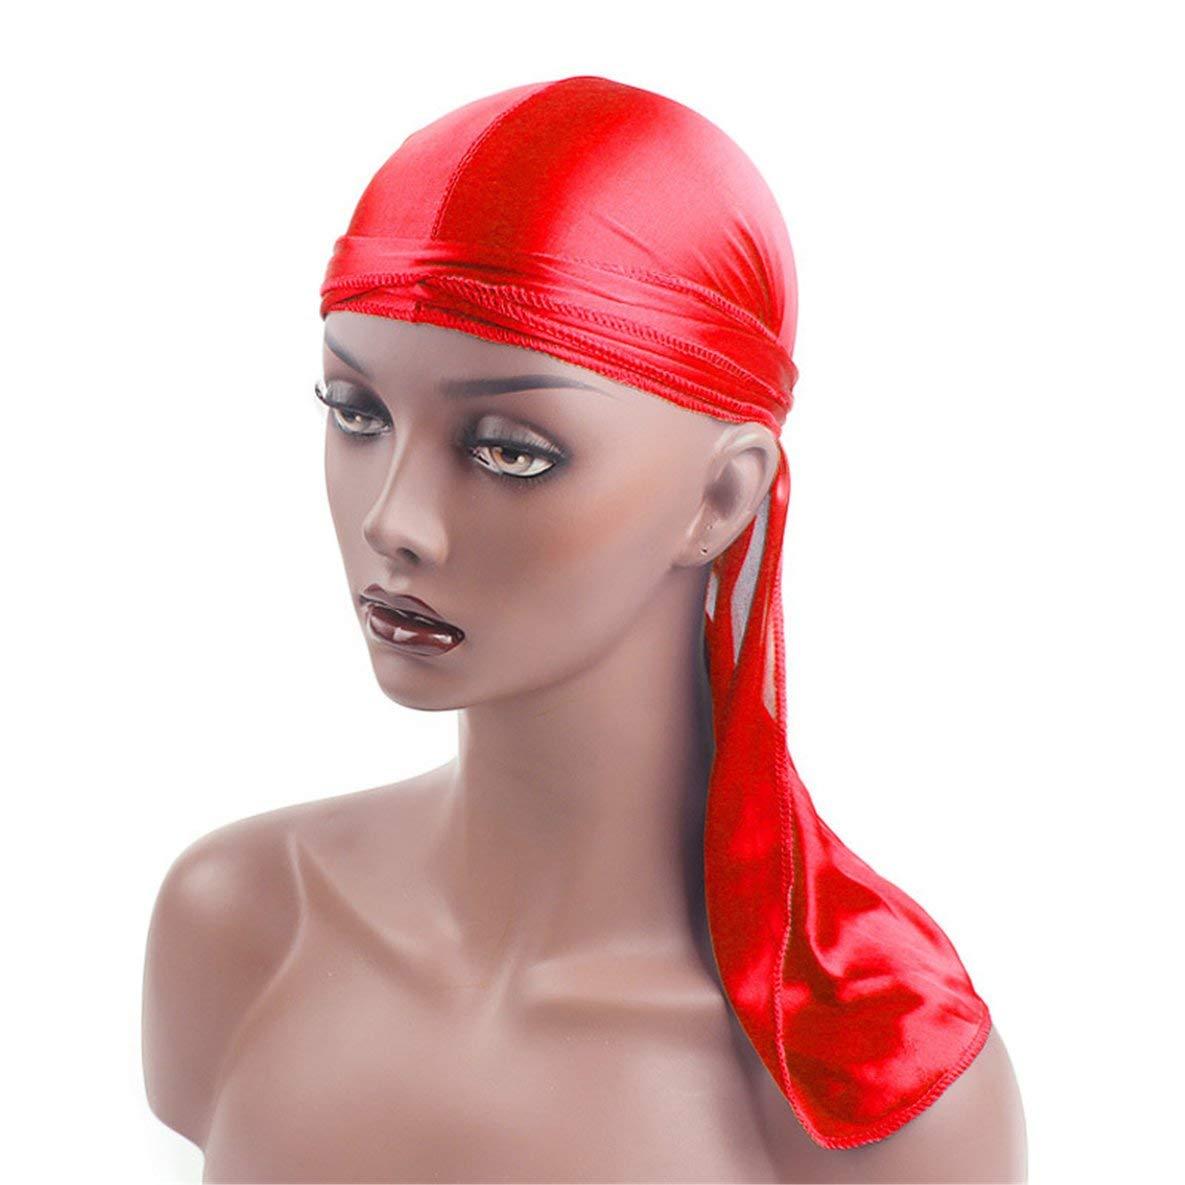 Noradtjcca M/änner Frauen Seidensatin Atmungsaktiv Seidig Durag 360 Wave Cool Bandana Hut Turban